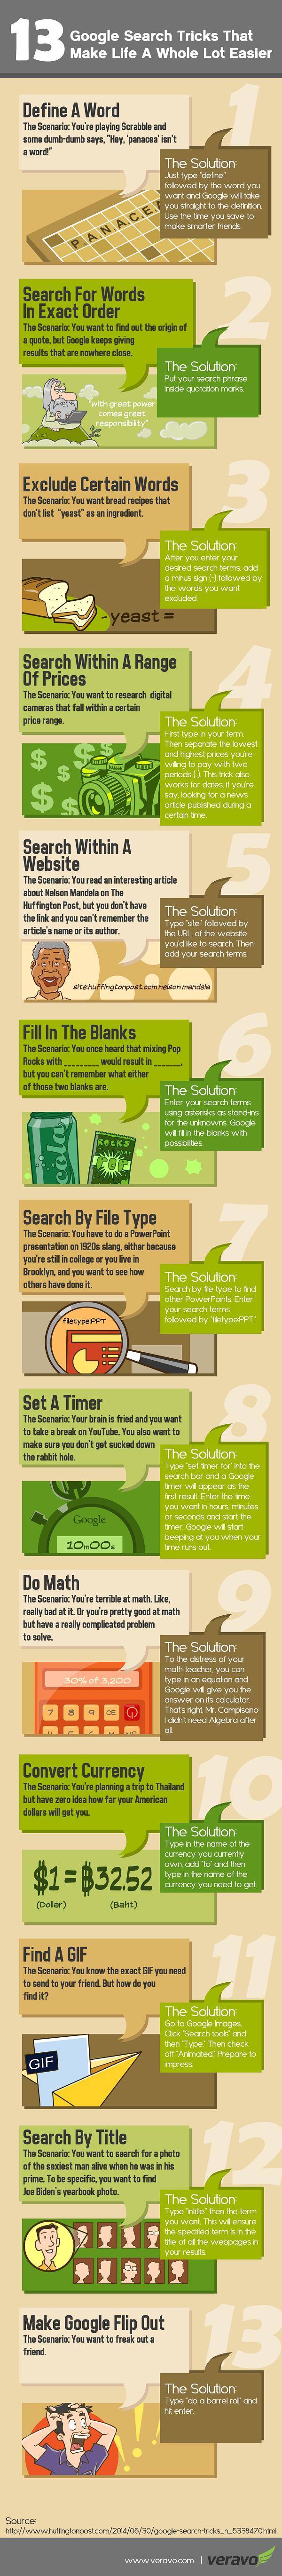 Google Search Tricks Infographic Educational Technology Information Literacy Google Tricks